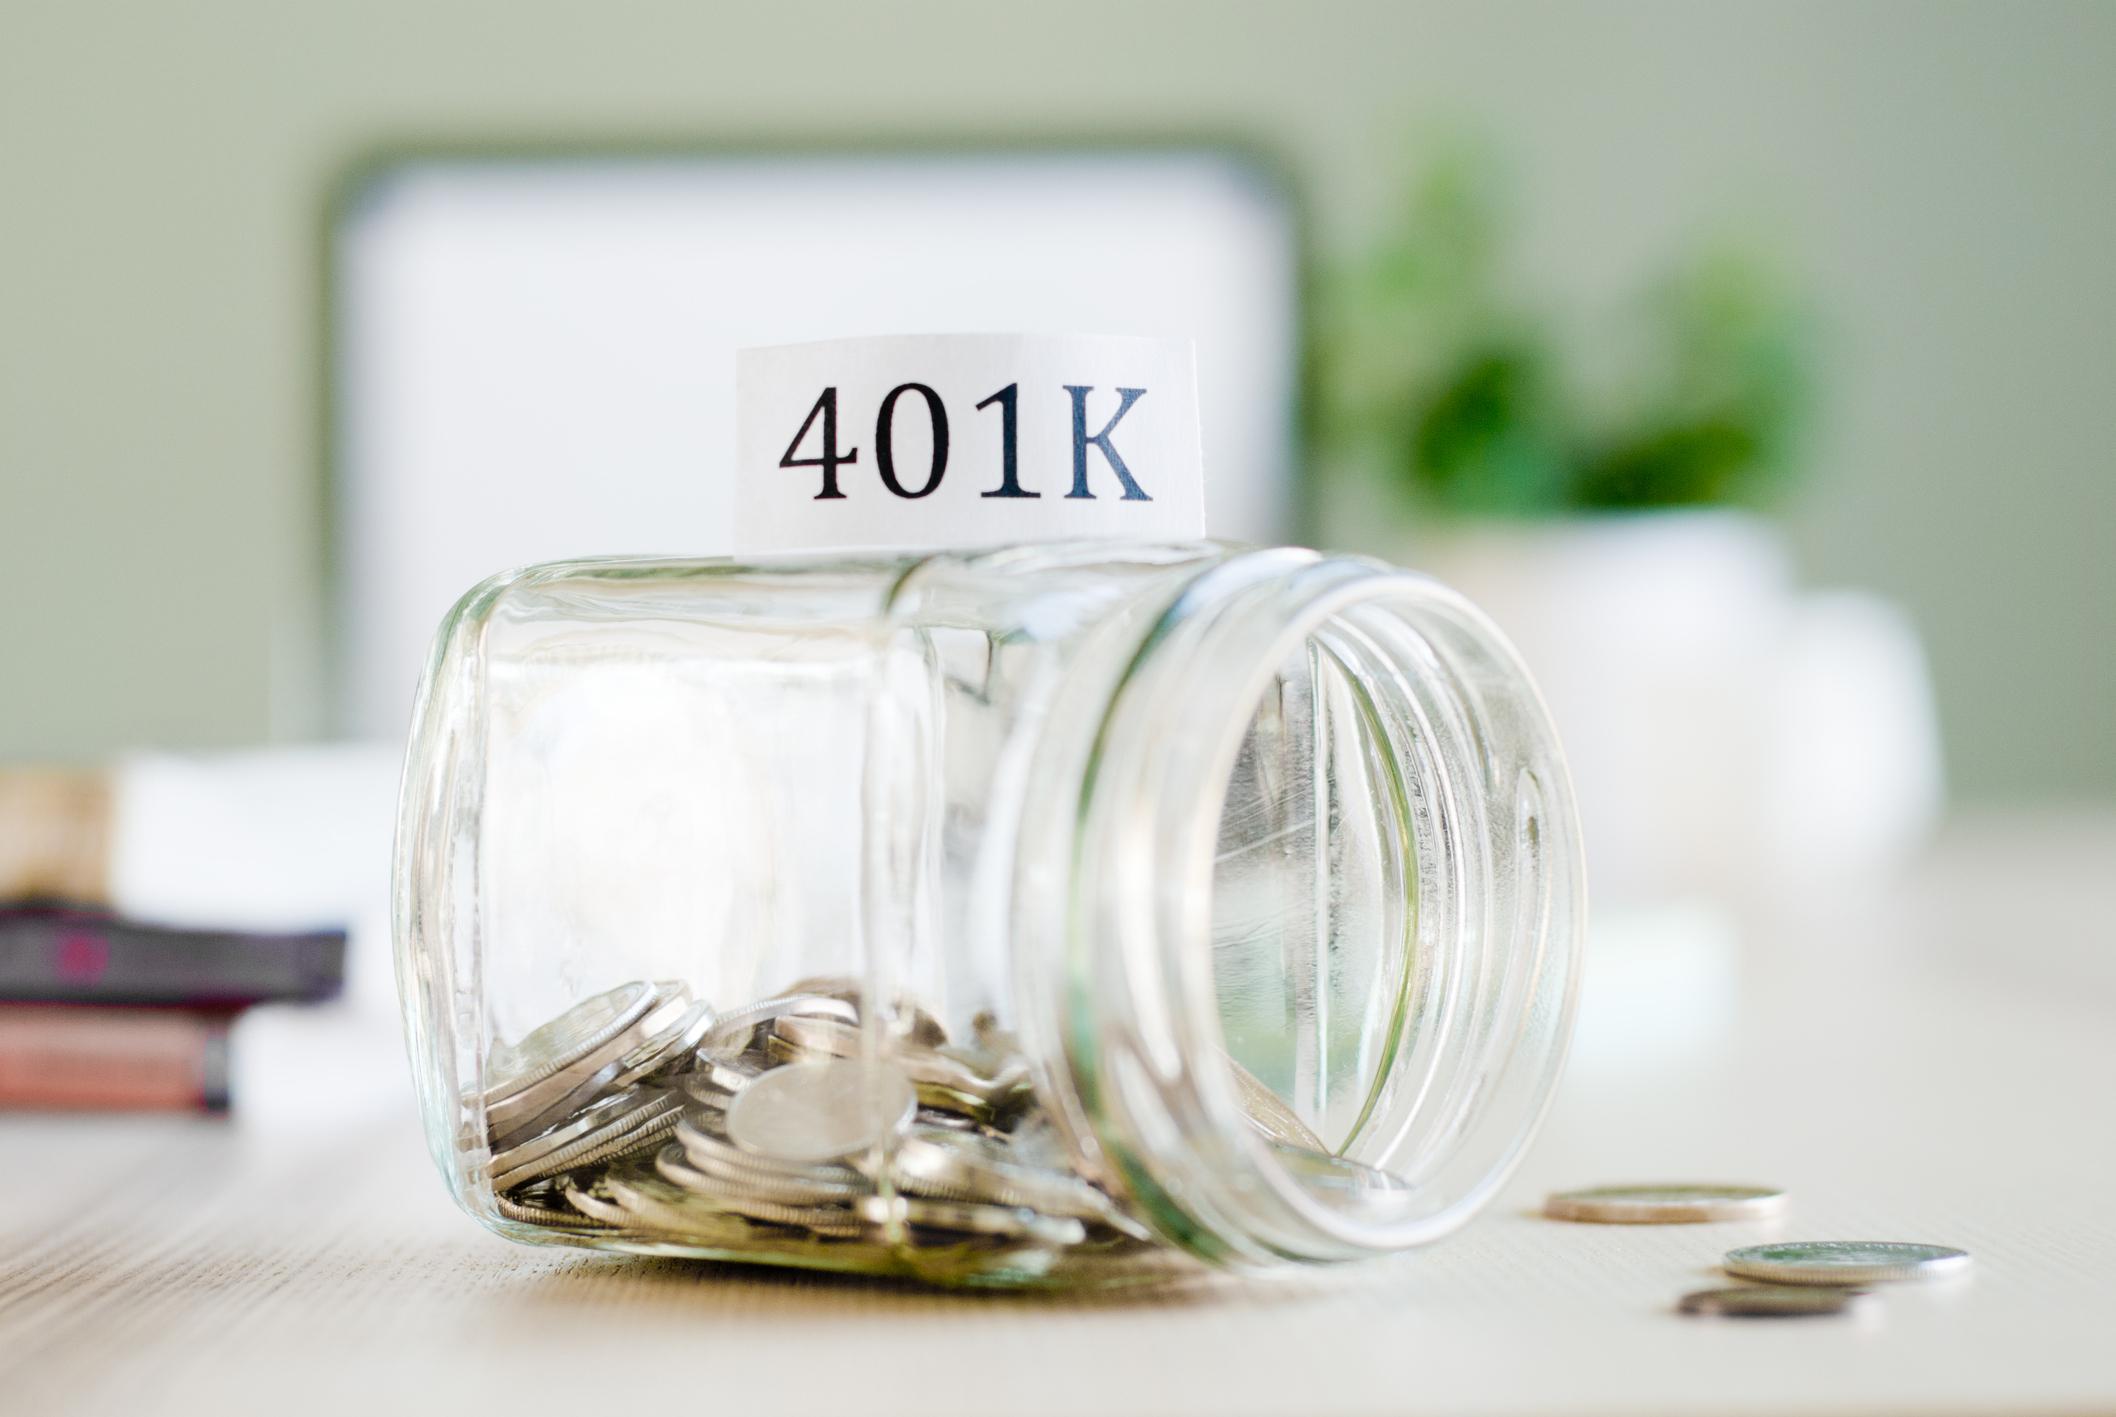 401k savings jar with coins